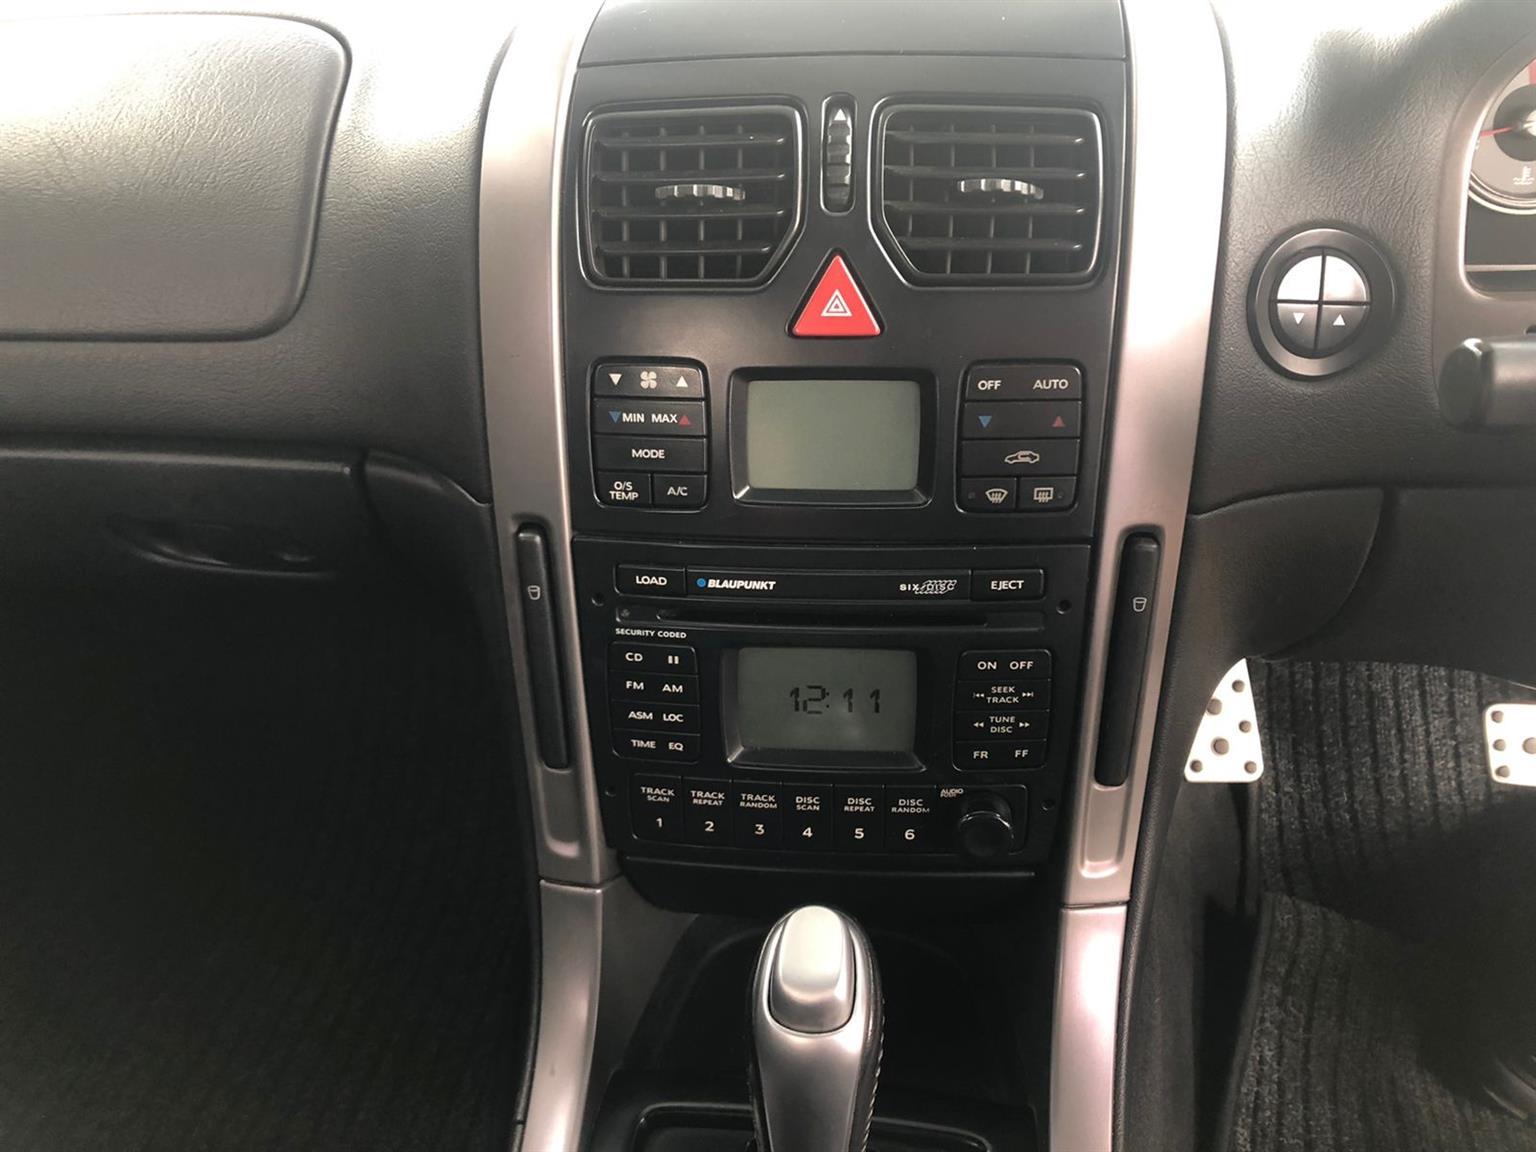 2004 Chevrolet Lumina Single Cab